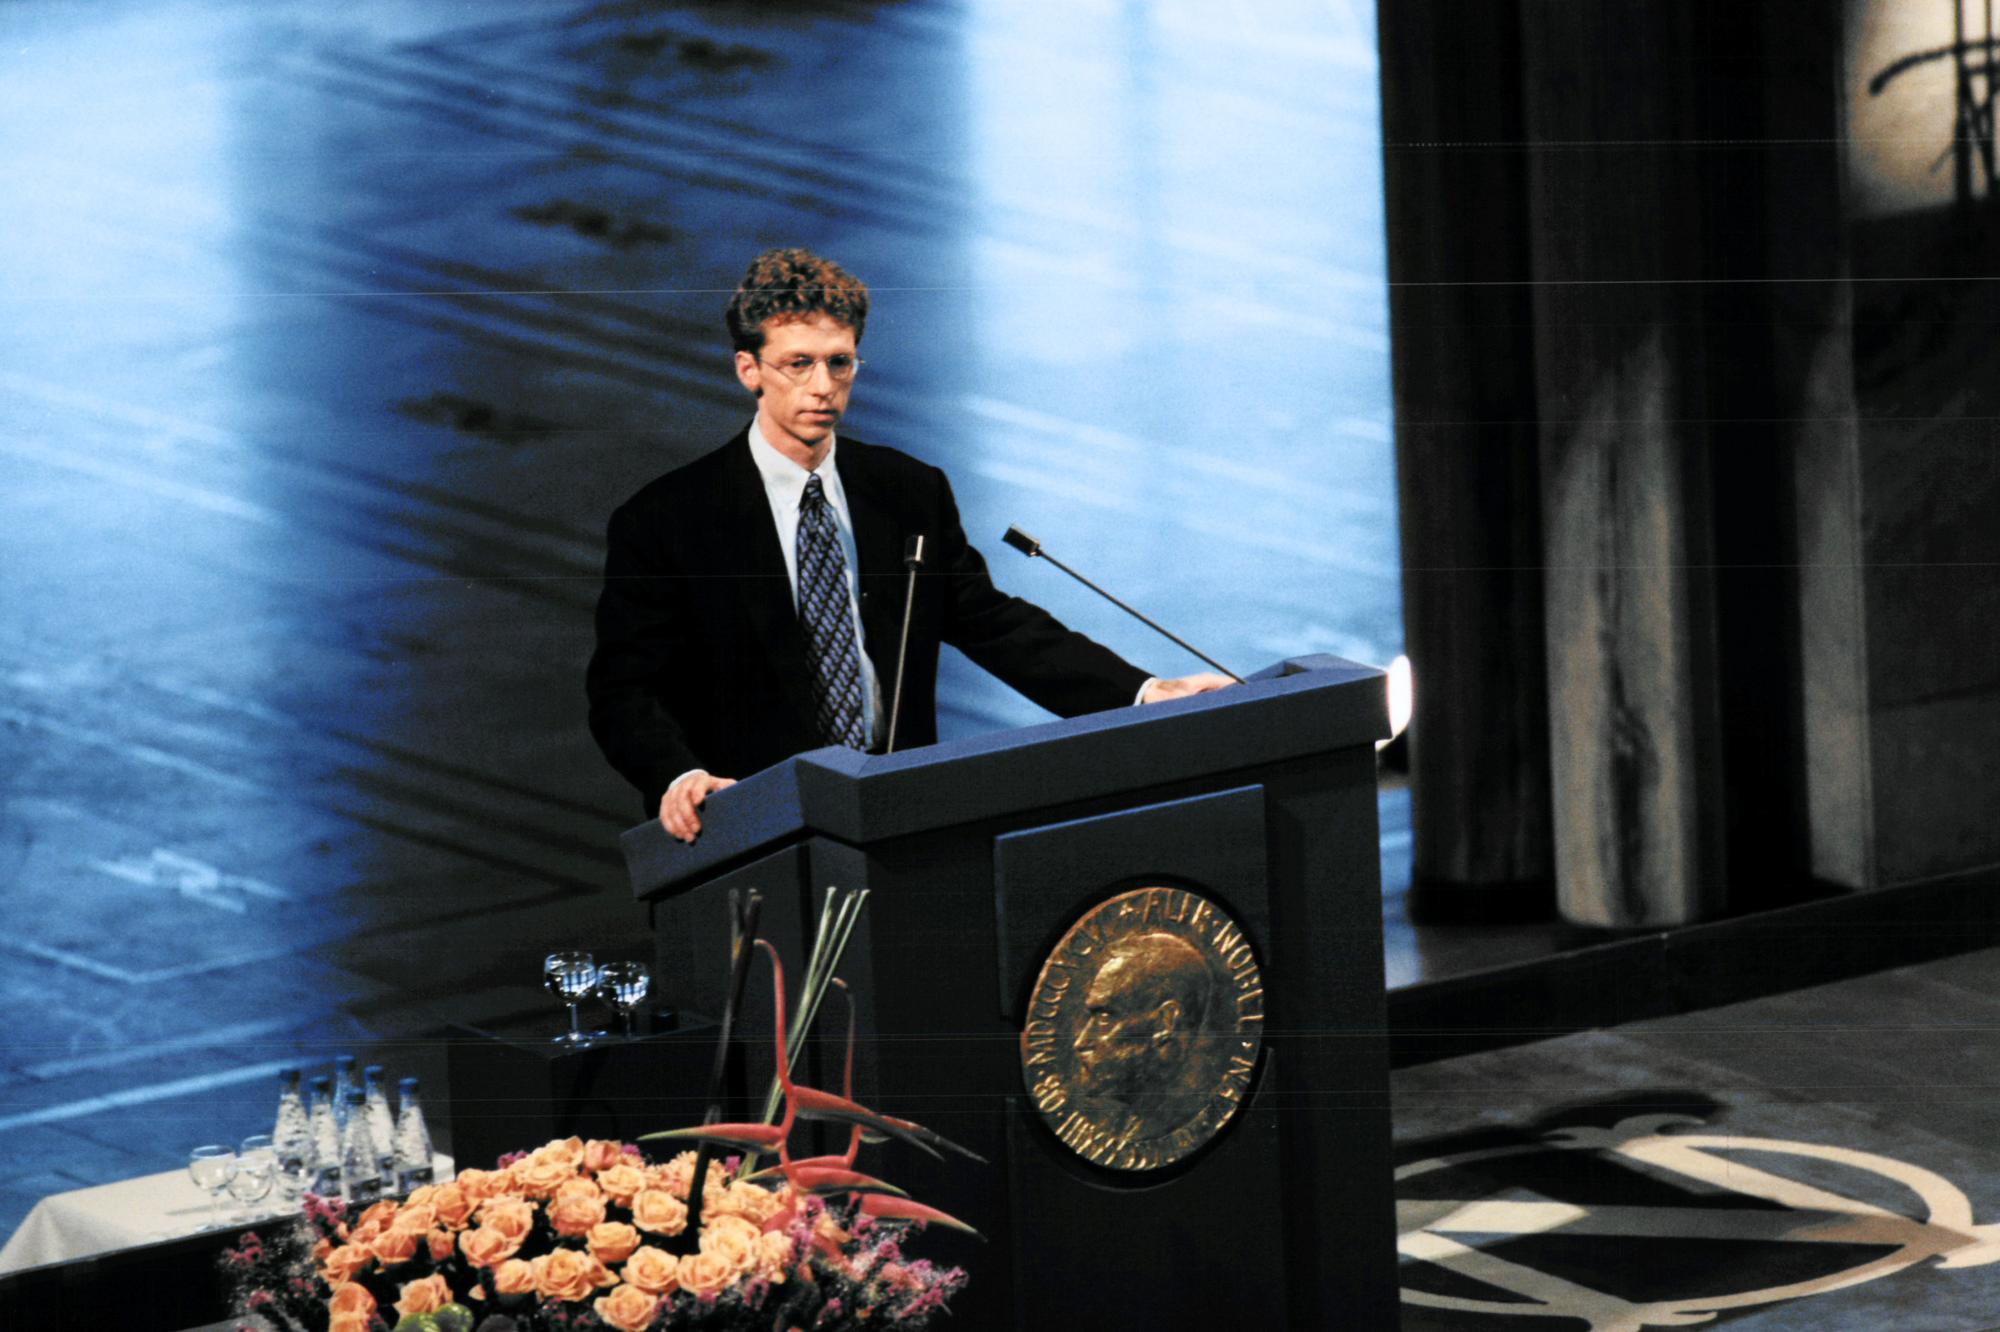 Dr James Orbinski accepts the 1999 Nobel Peace Prize on behalf of MSF